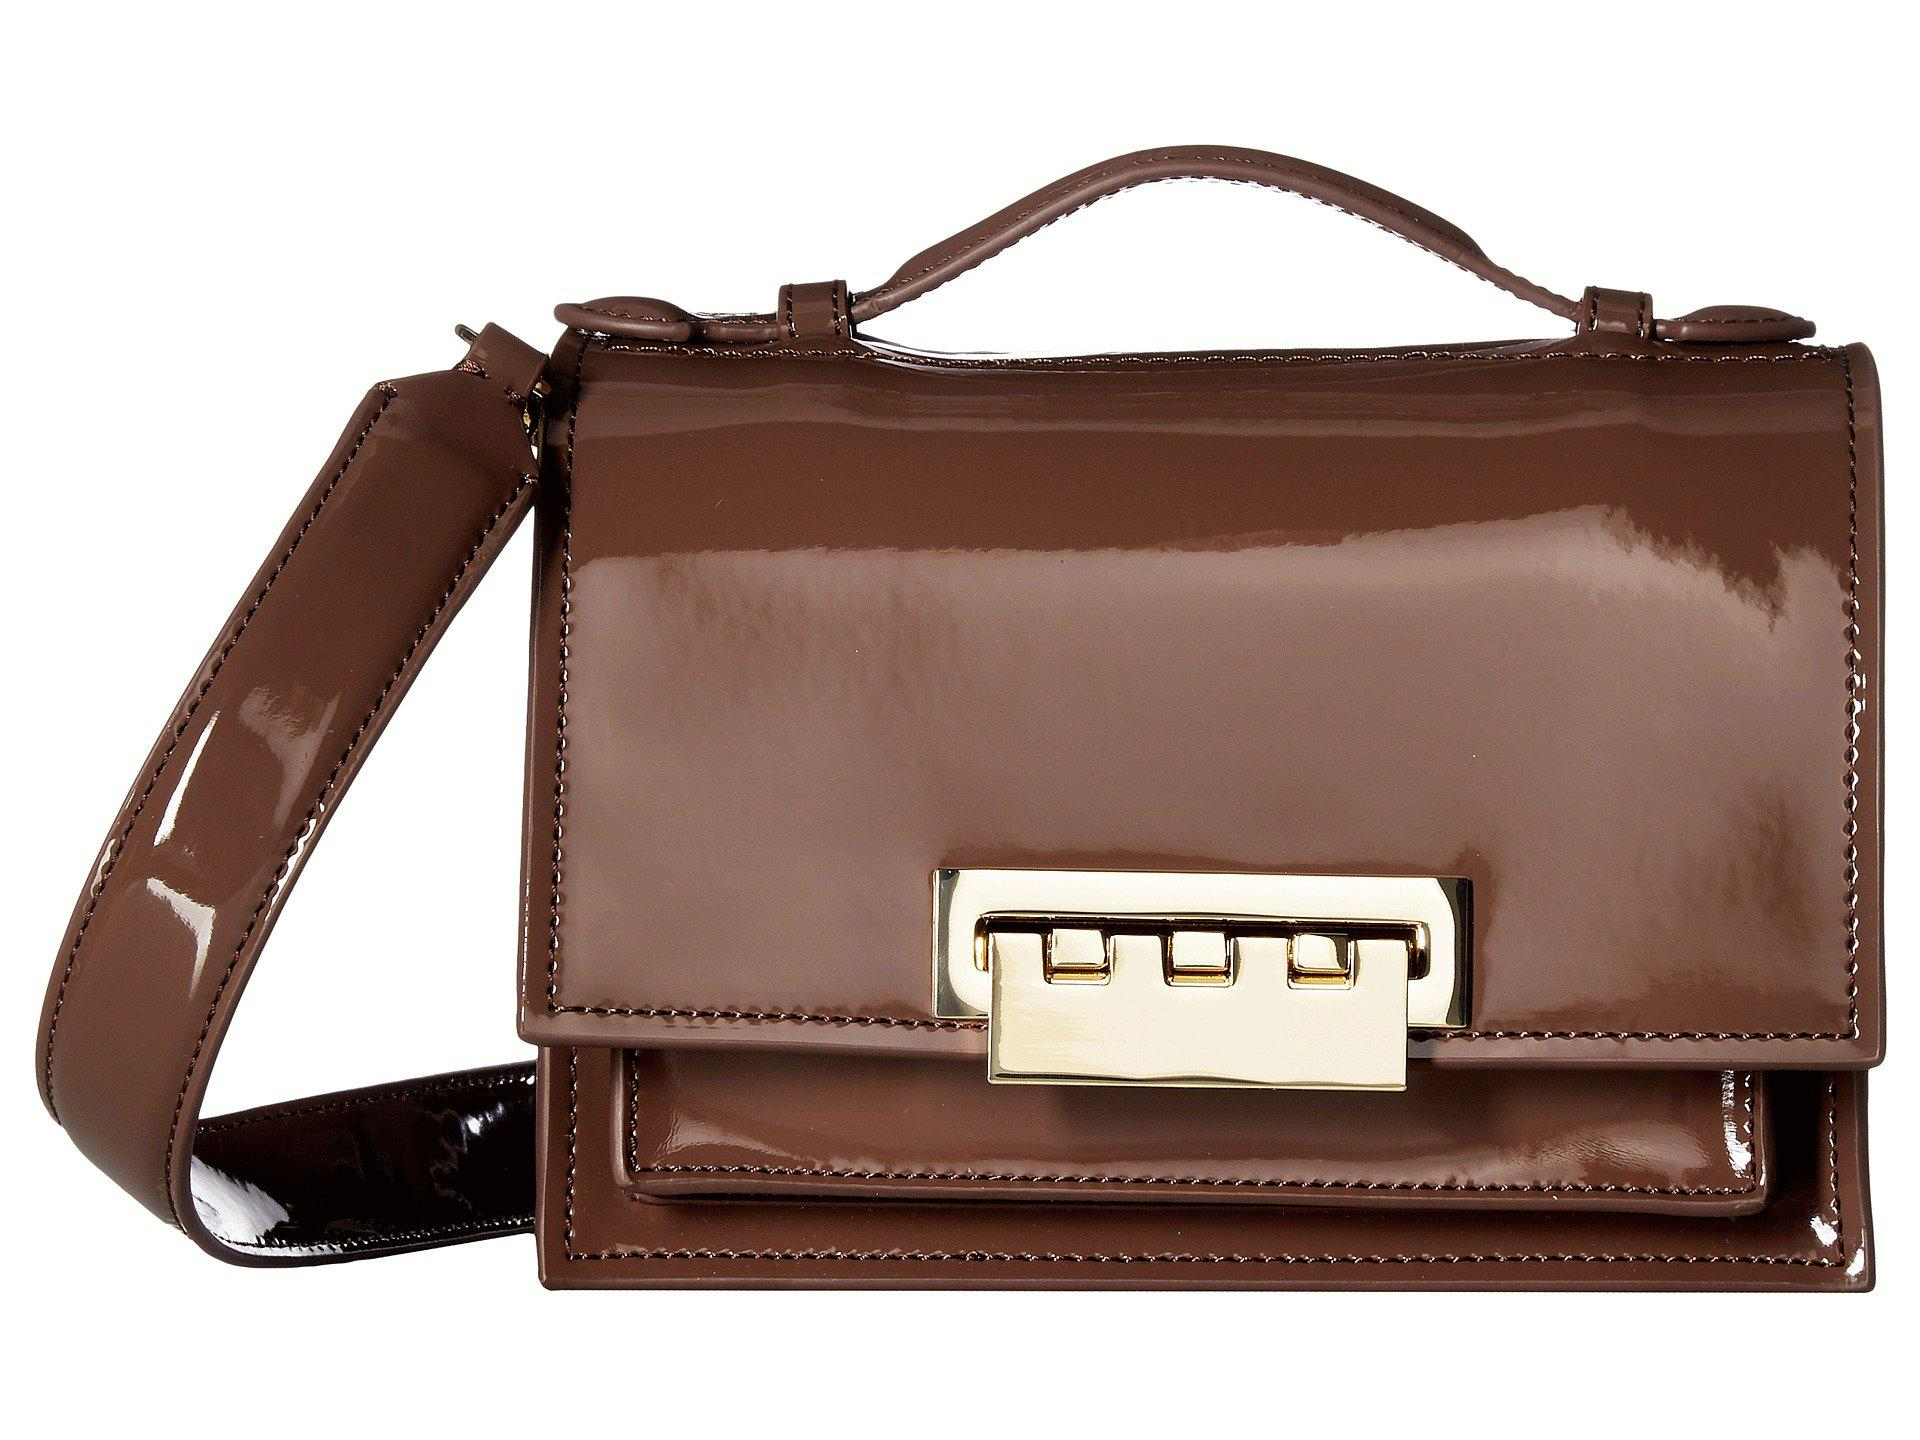 ff0ee0c35a8 Lyst - Zac Zac Posen Earthette Accordian Shoulder Bag in Brown